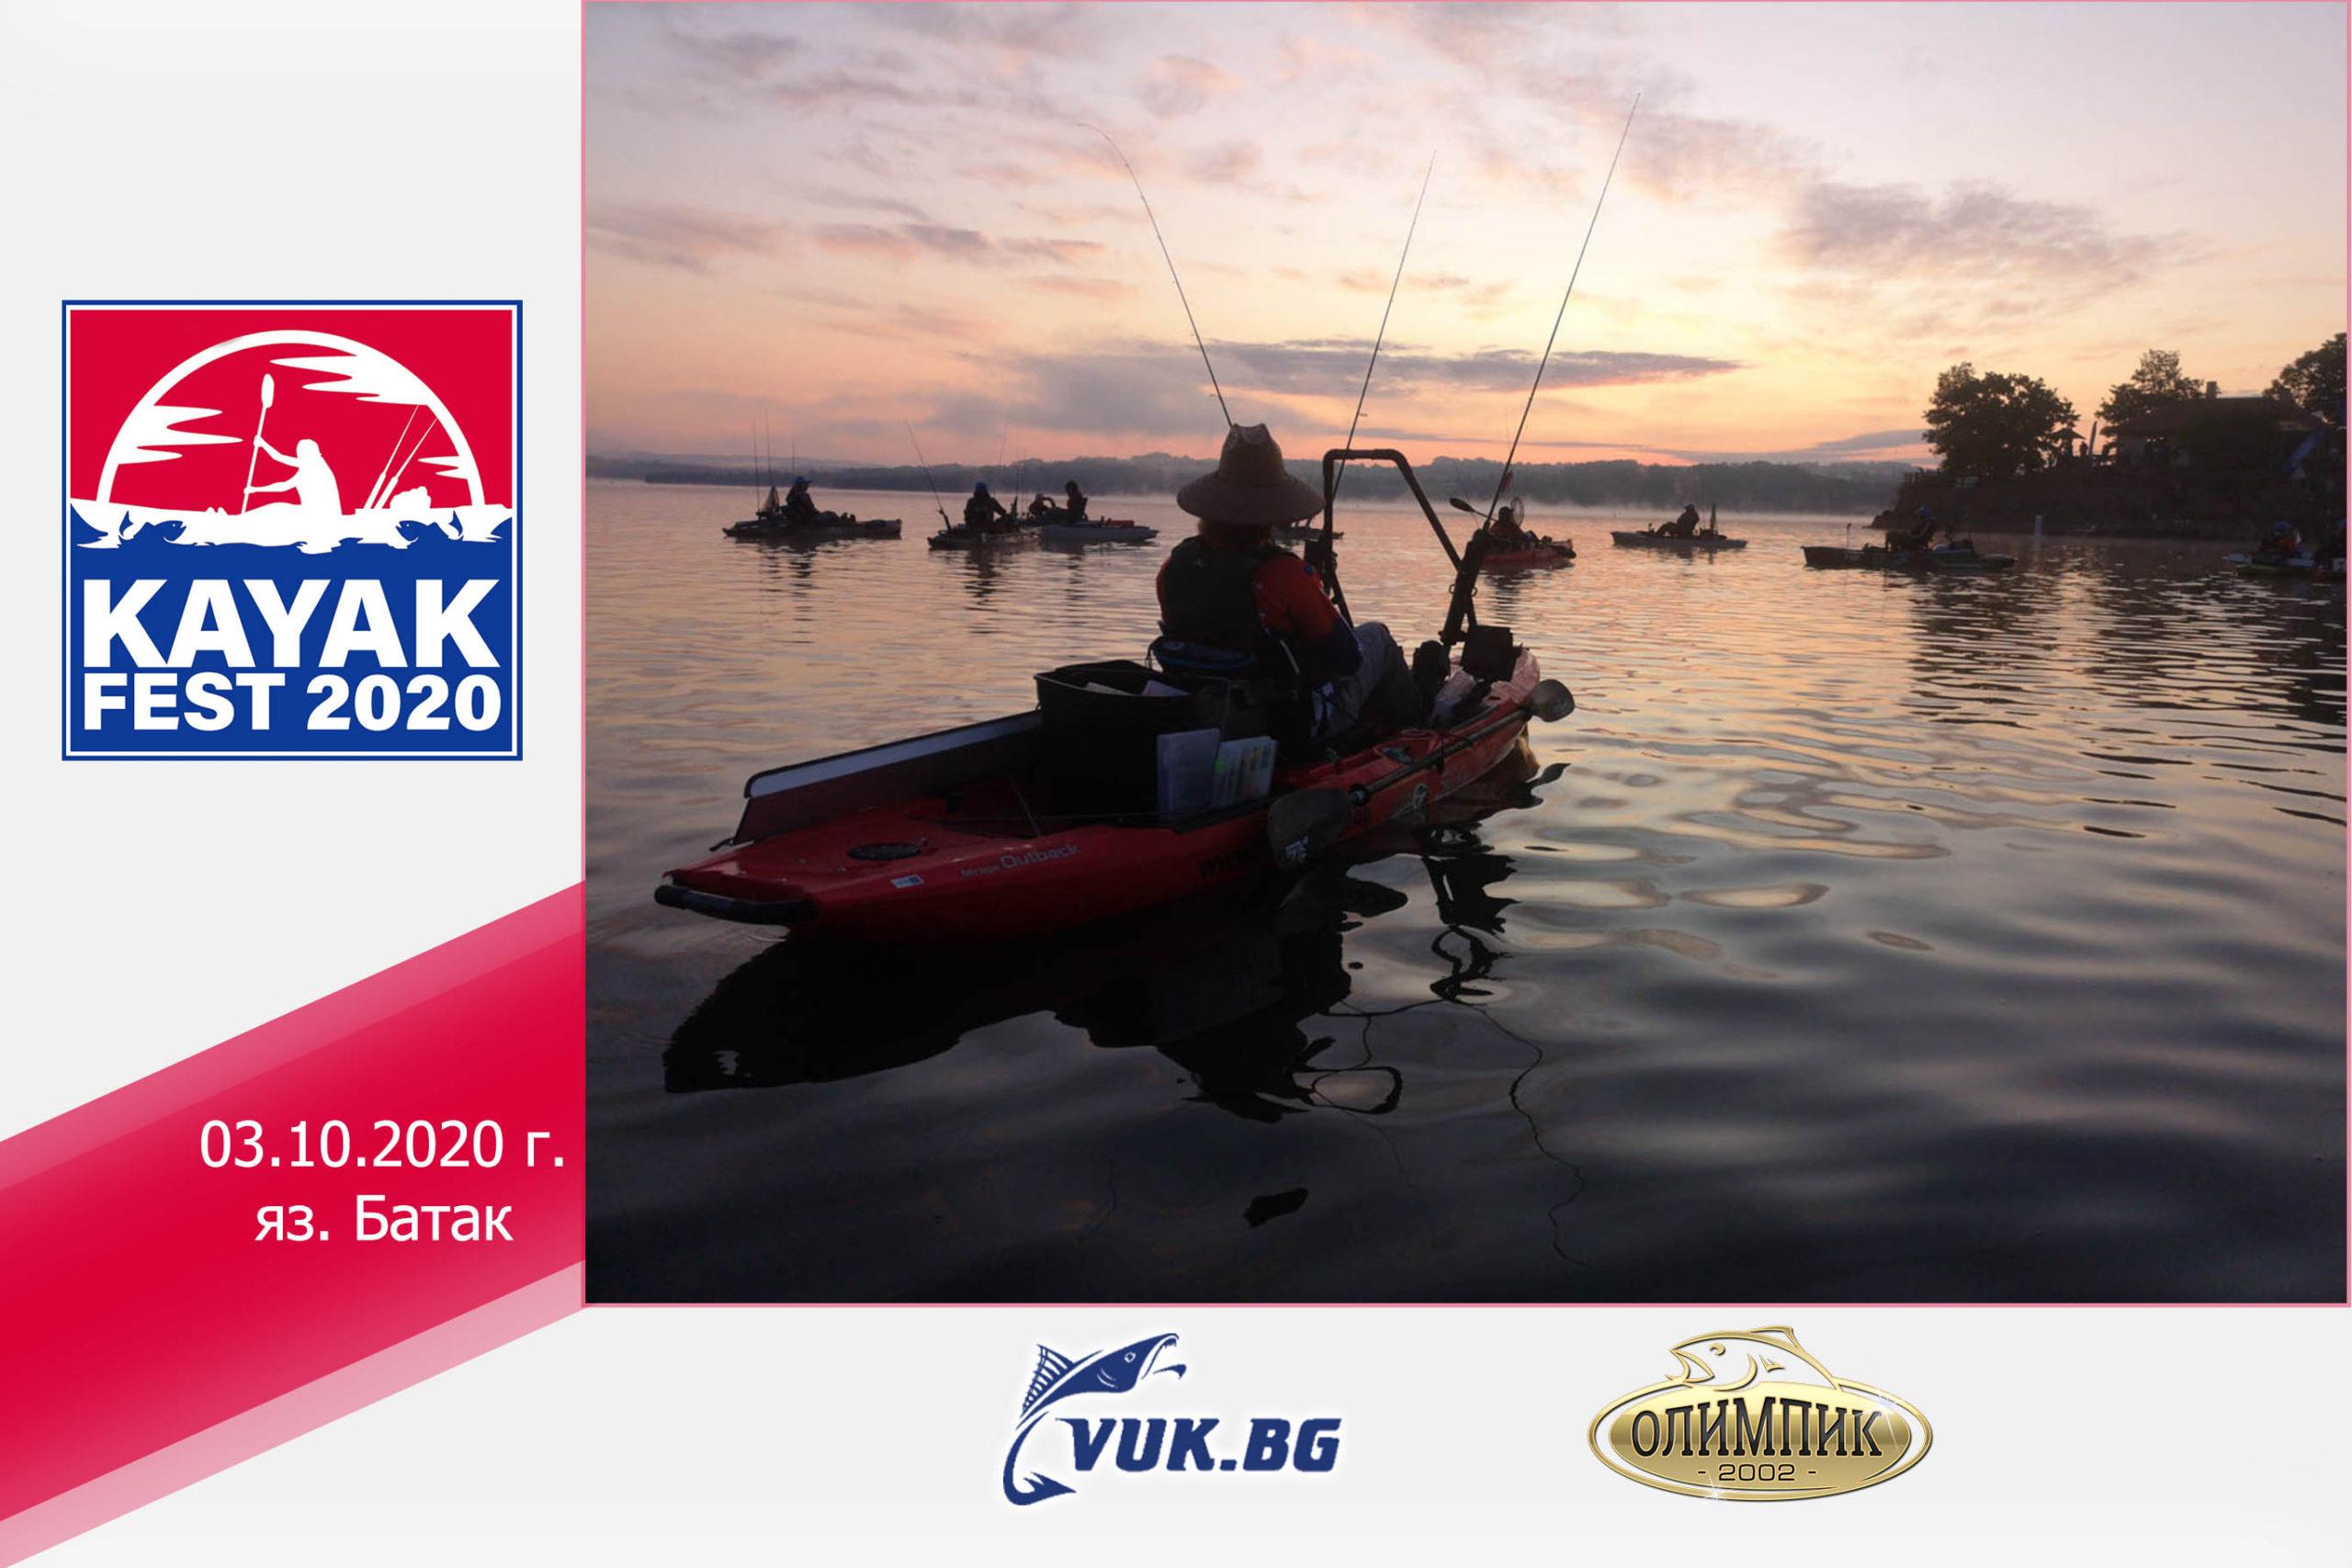 Kayak Fest Batak 2020 - организация и регламент